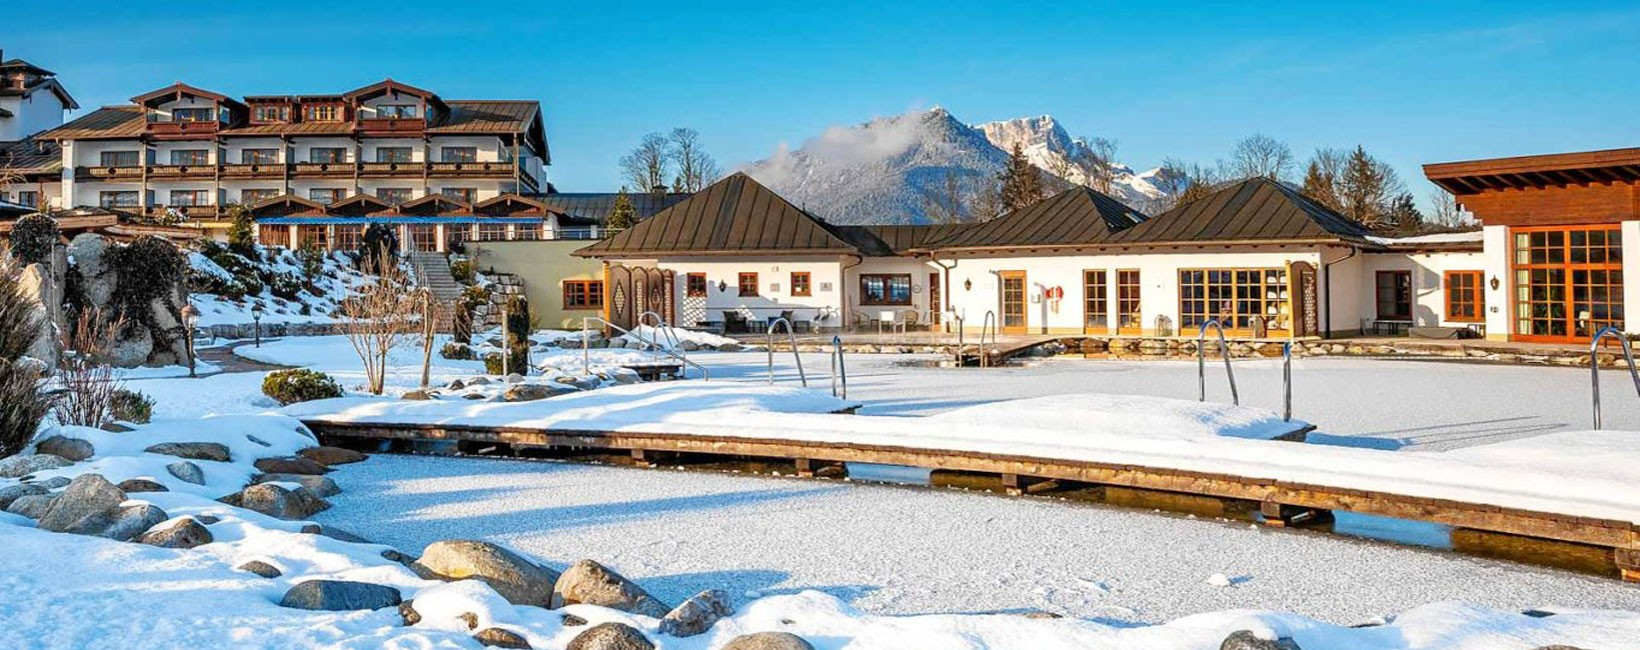 Hotels in Berchtesgaden - Alpenhotel Zechmeisterlehen